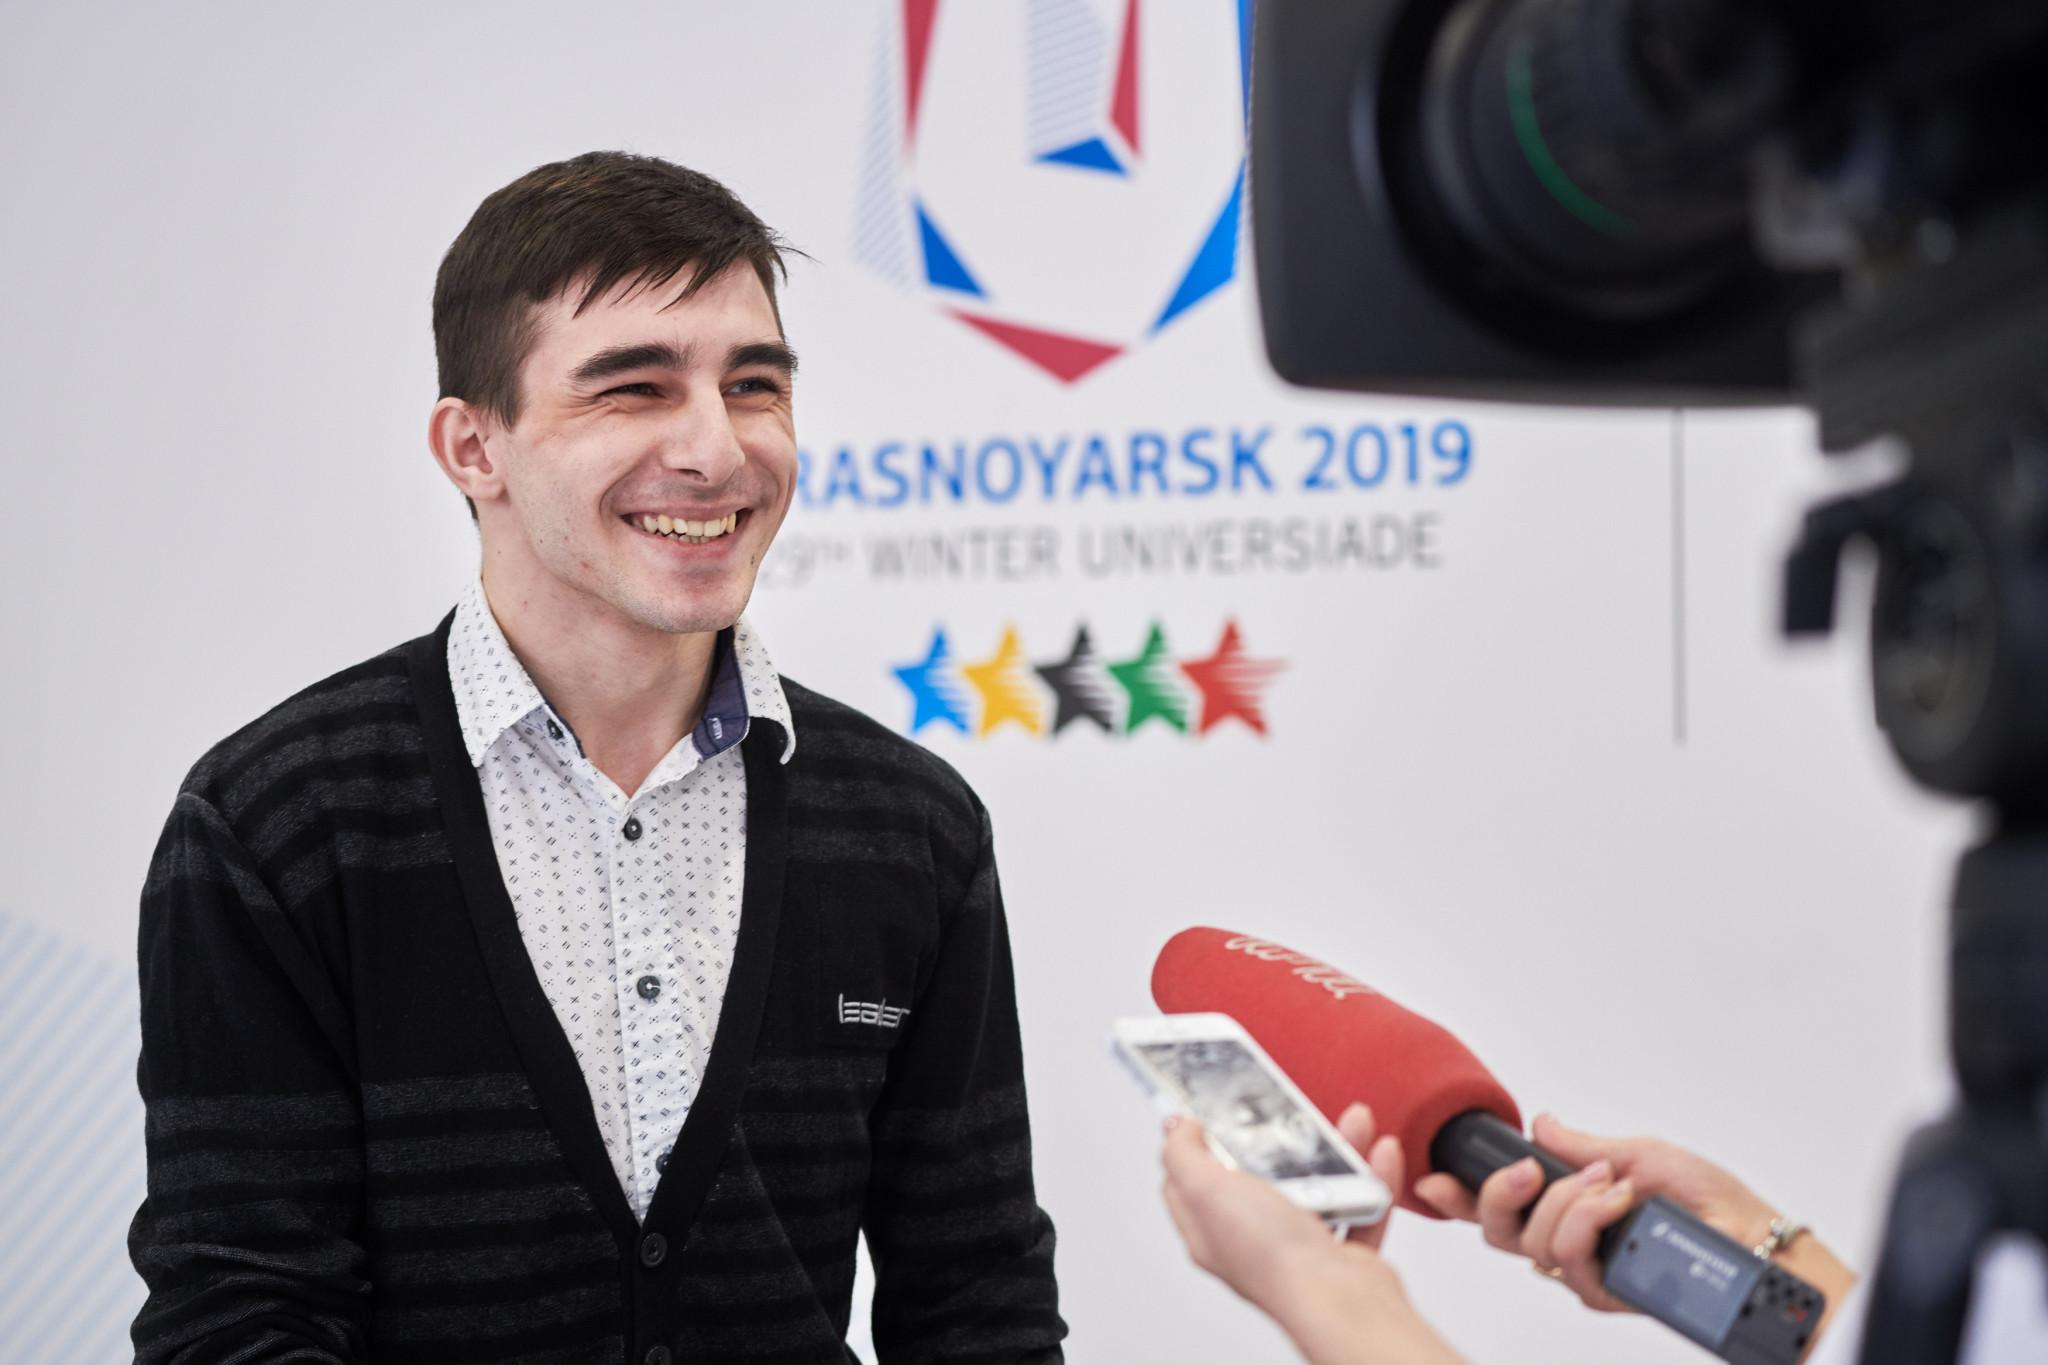 About 5,000 volunteers are expected to be involved in Krasnoyarsk 2019 activities ©Krasnoyarsk 2019